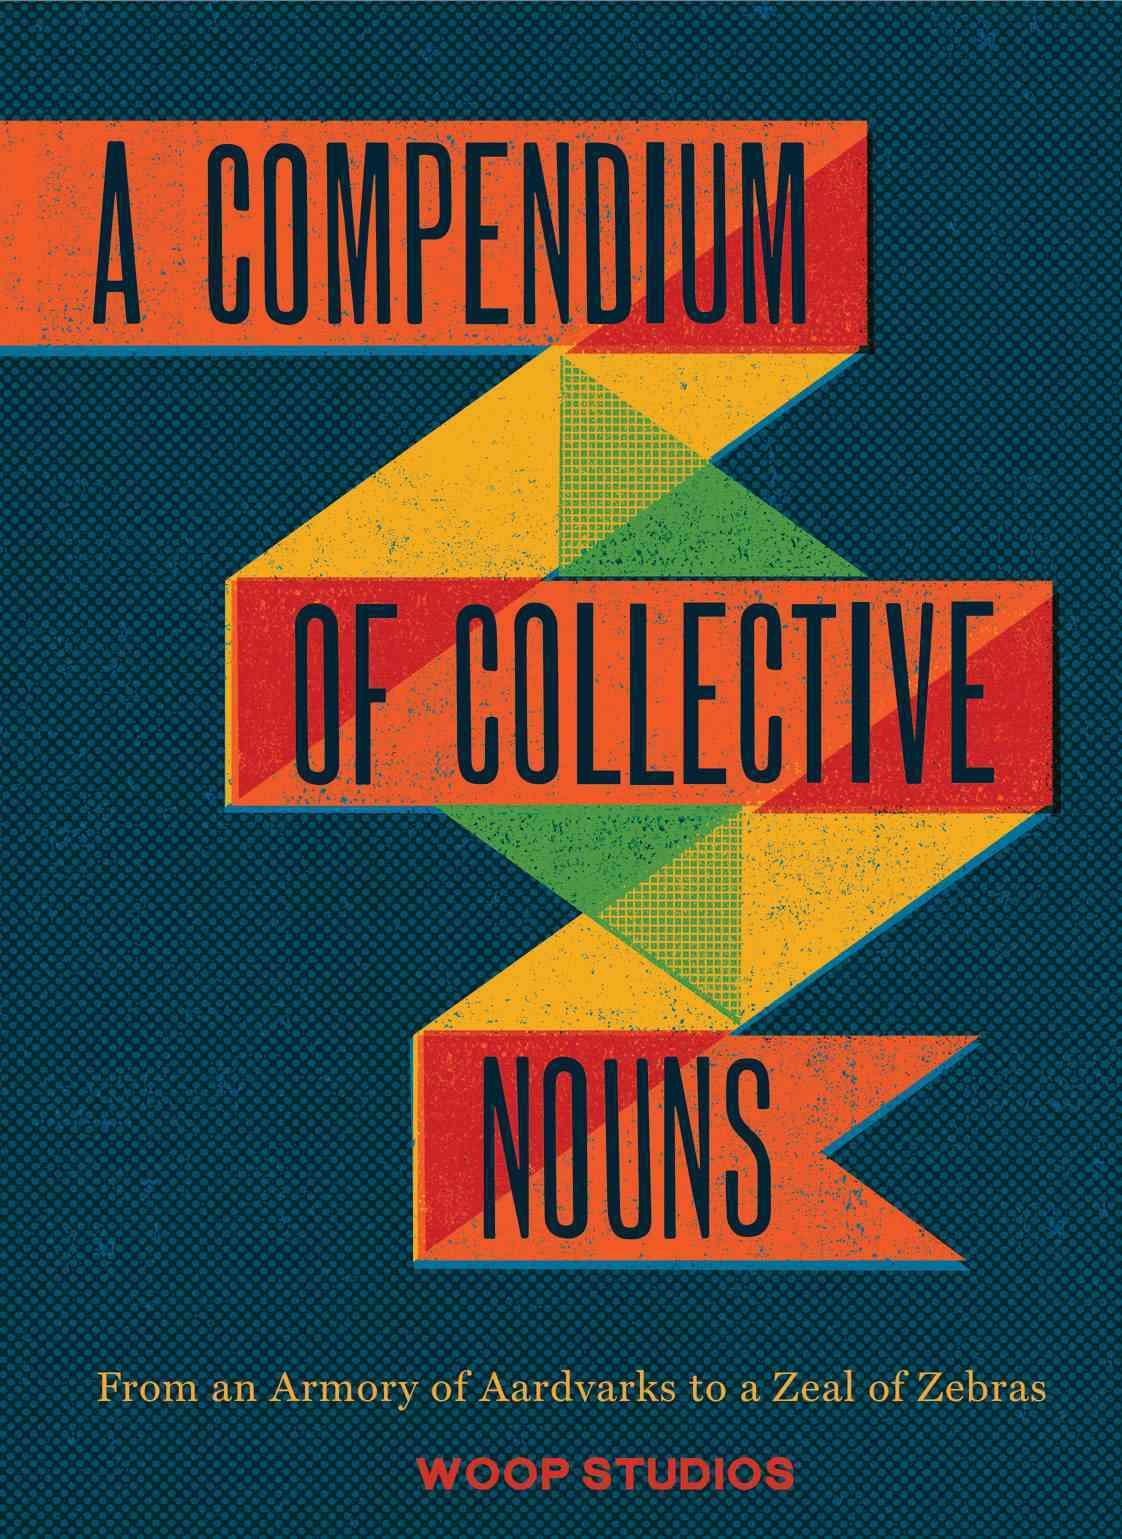 A Compendium of Collective Nouns By Sacher, Jason